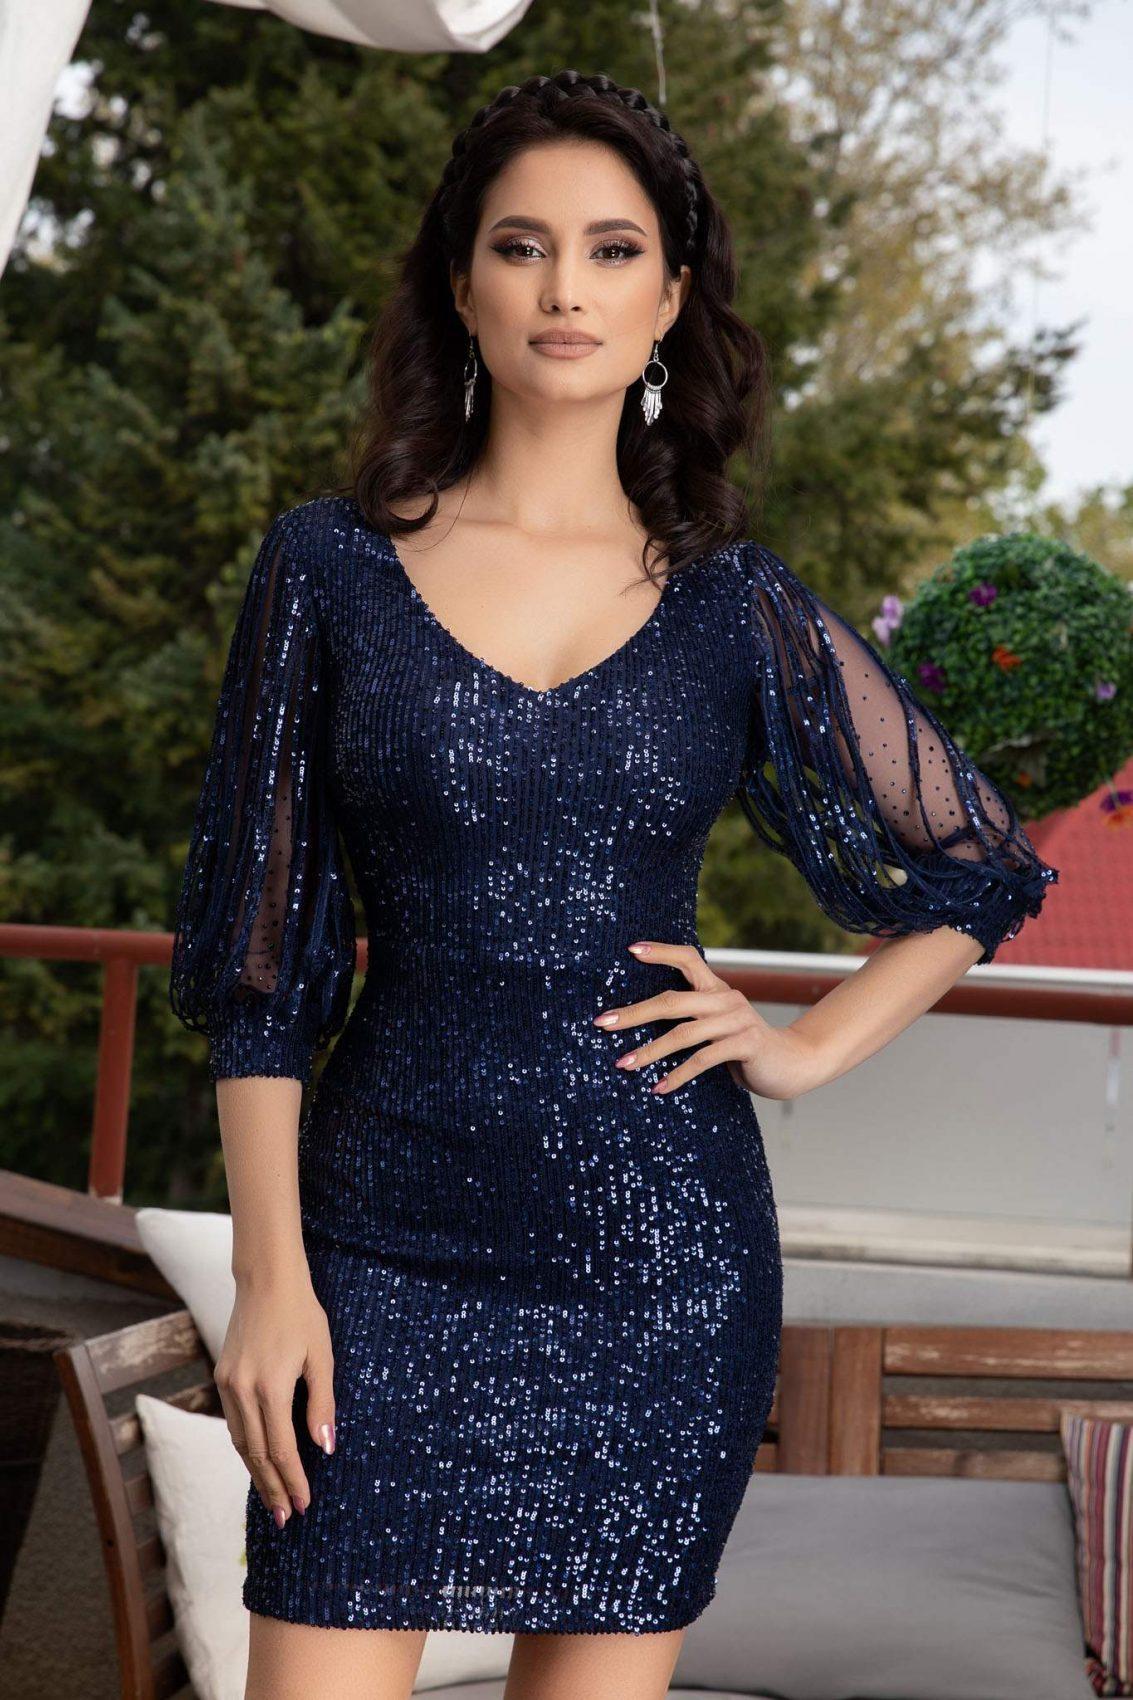 Katriss Μπλε Φόρεμα 1103